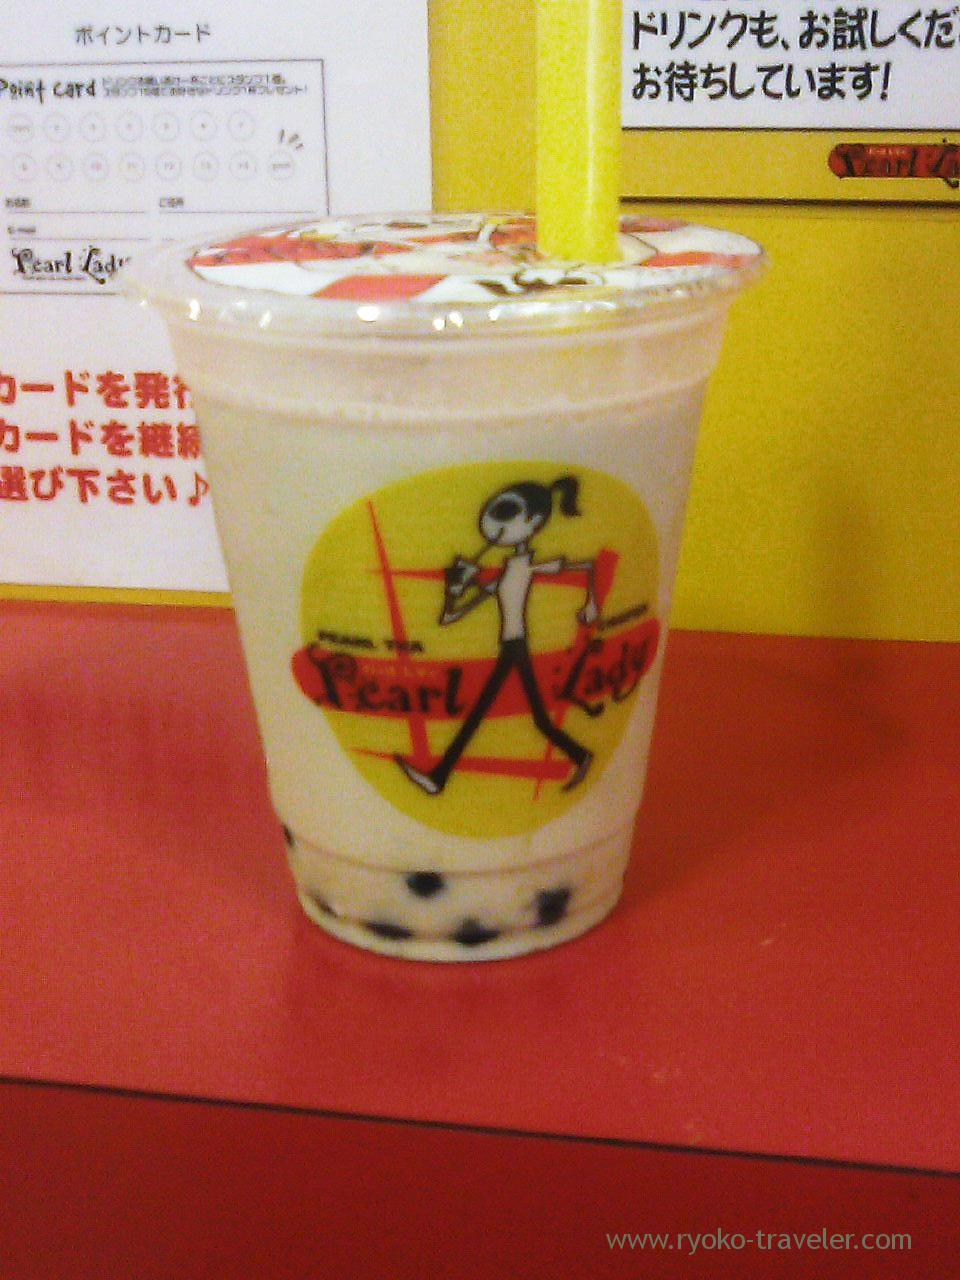 Coconuts tea, Pearl Lady Funabashi branch (Funabashi)